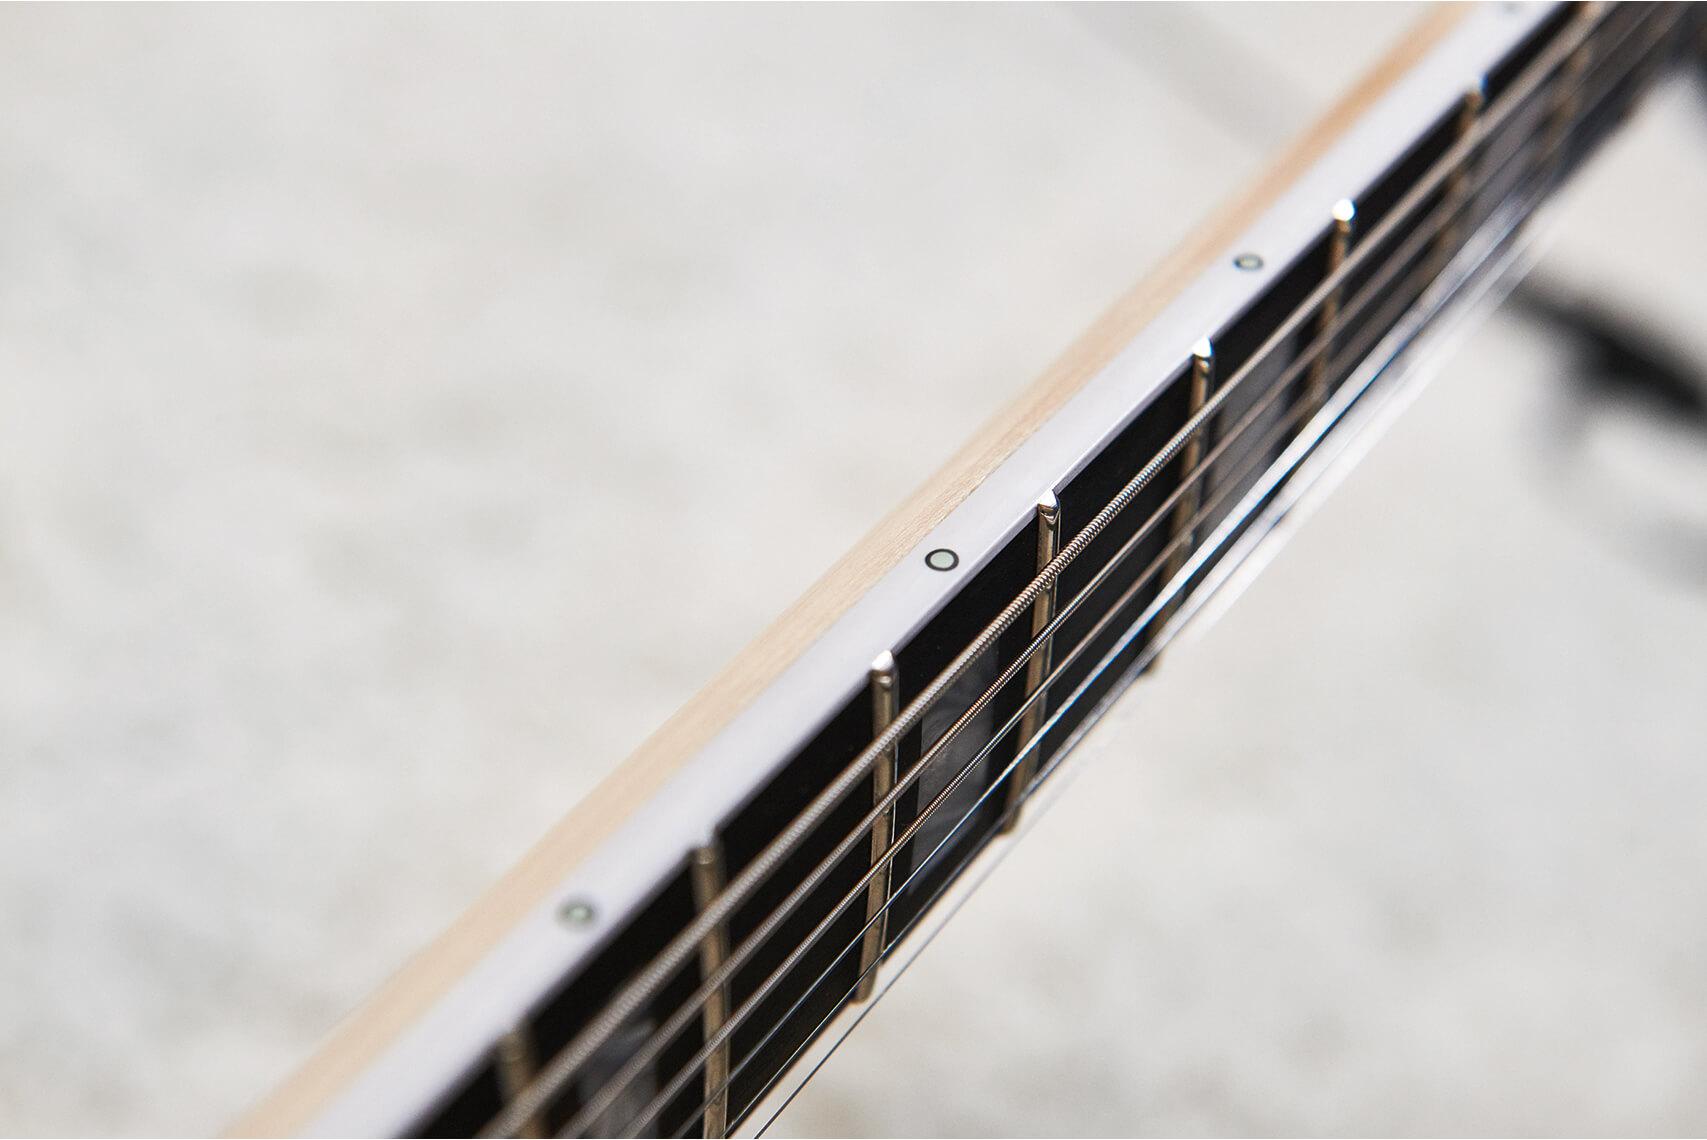 Jim Root's Jazzmaster Fretboard